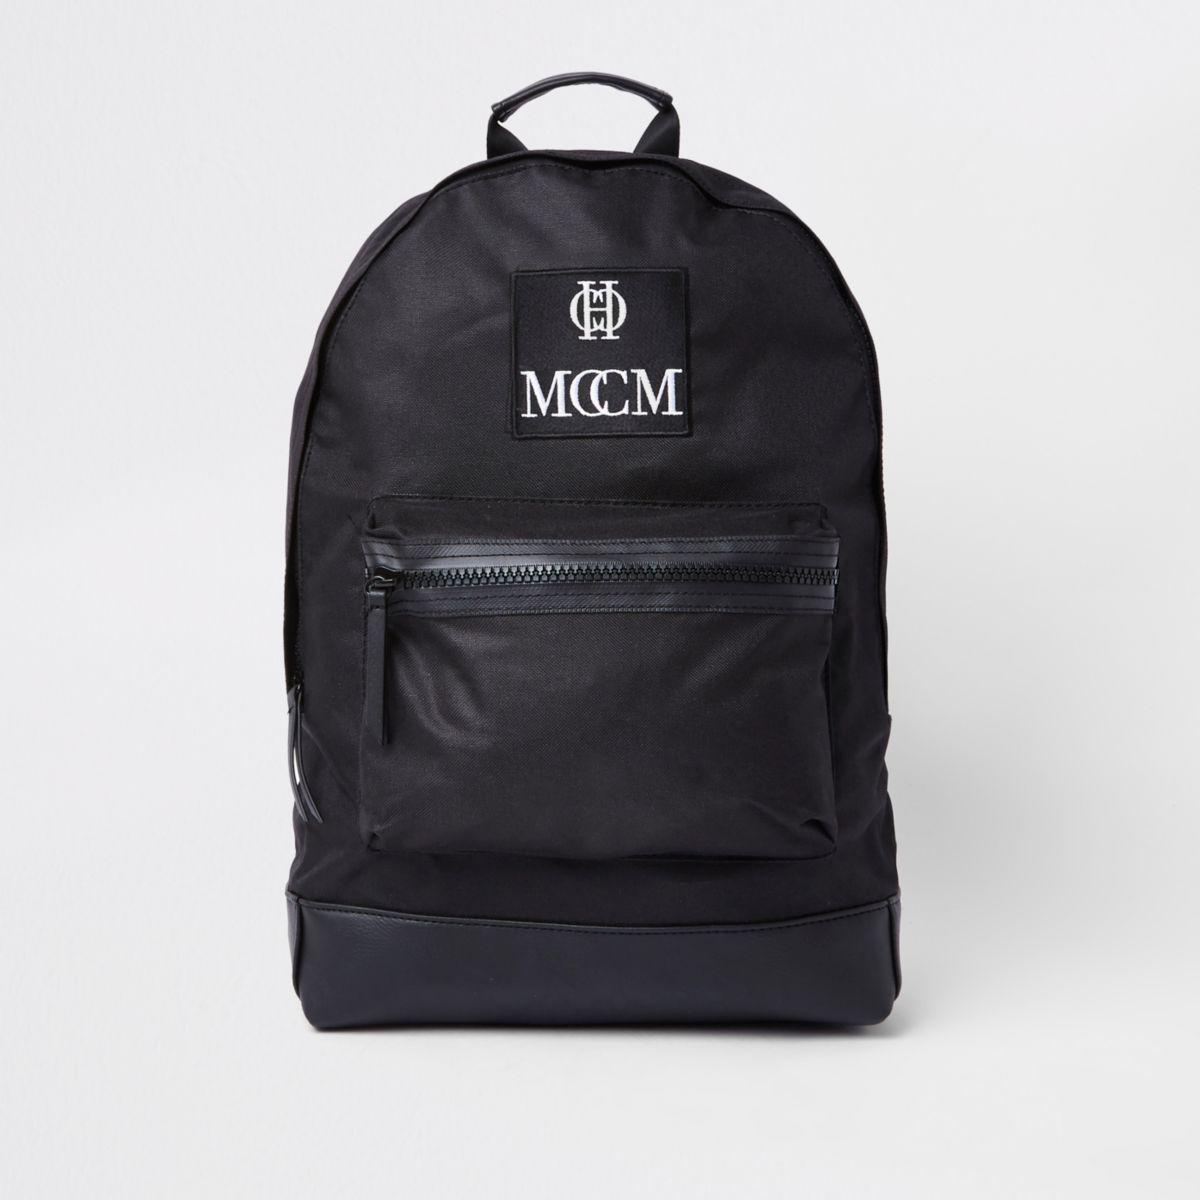 Black embroidered backpack